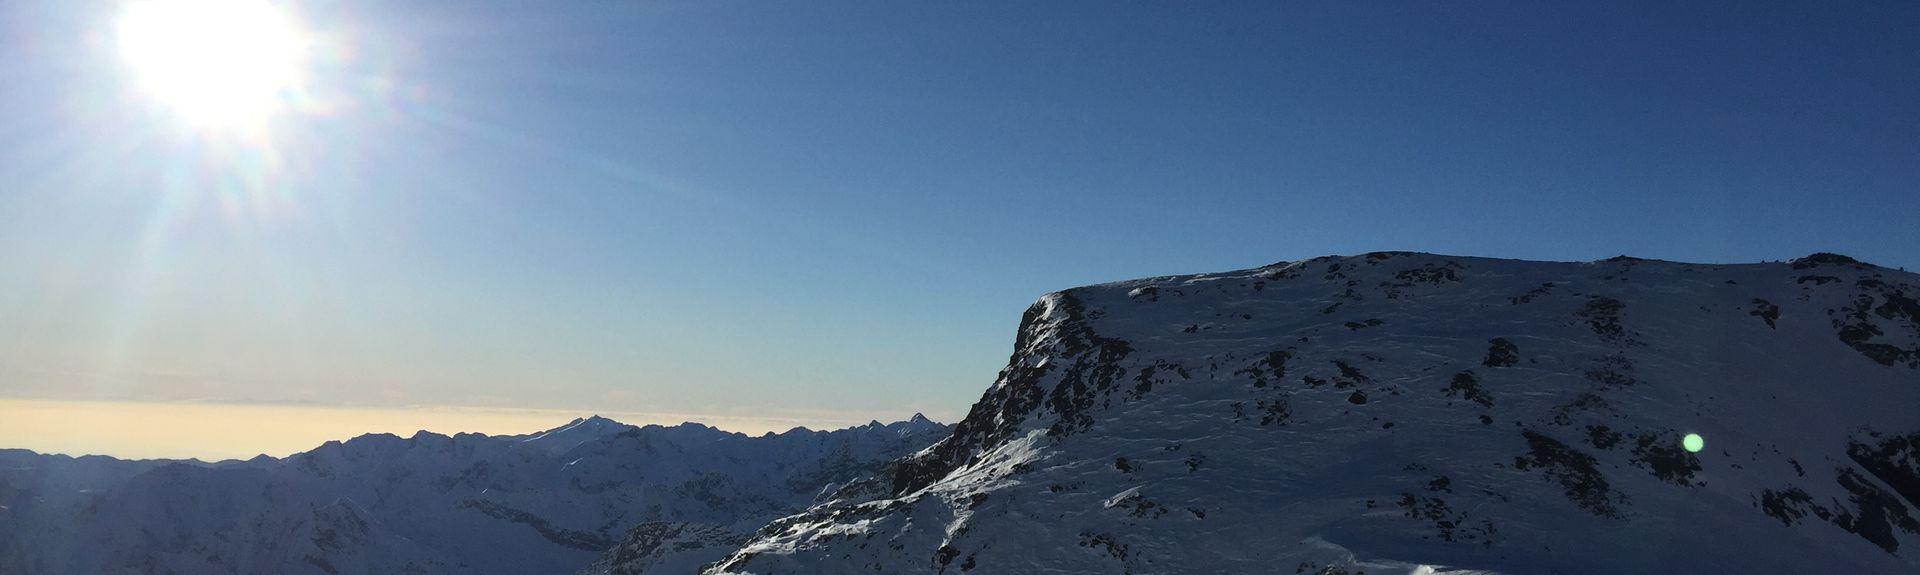 Issime, Valle d'Aosta, Italia